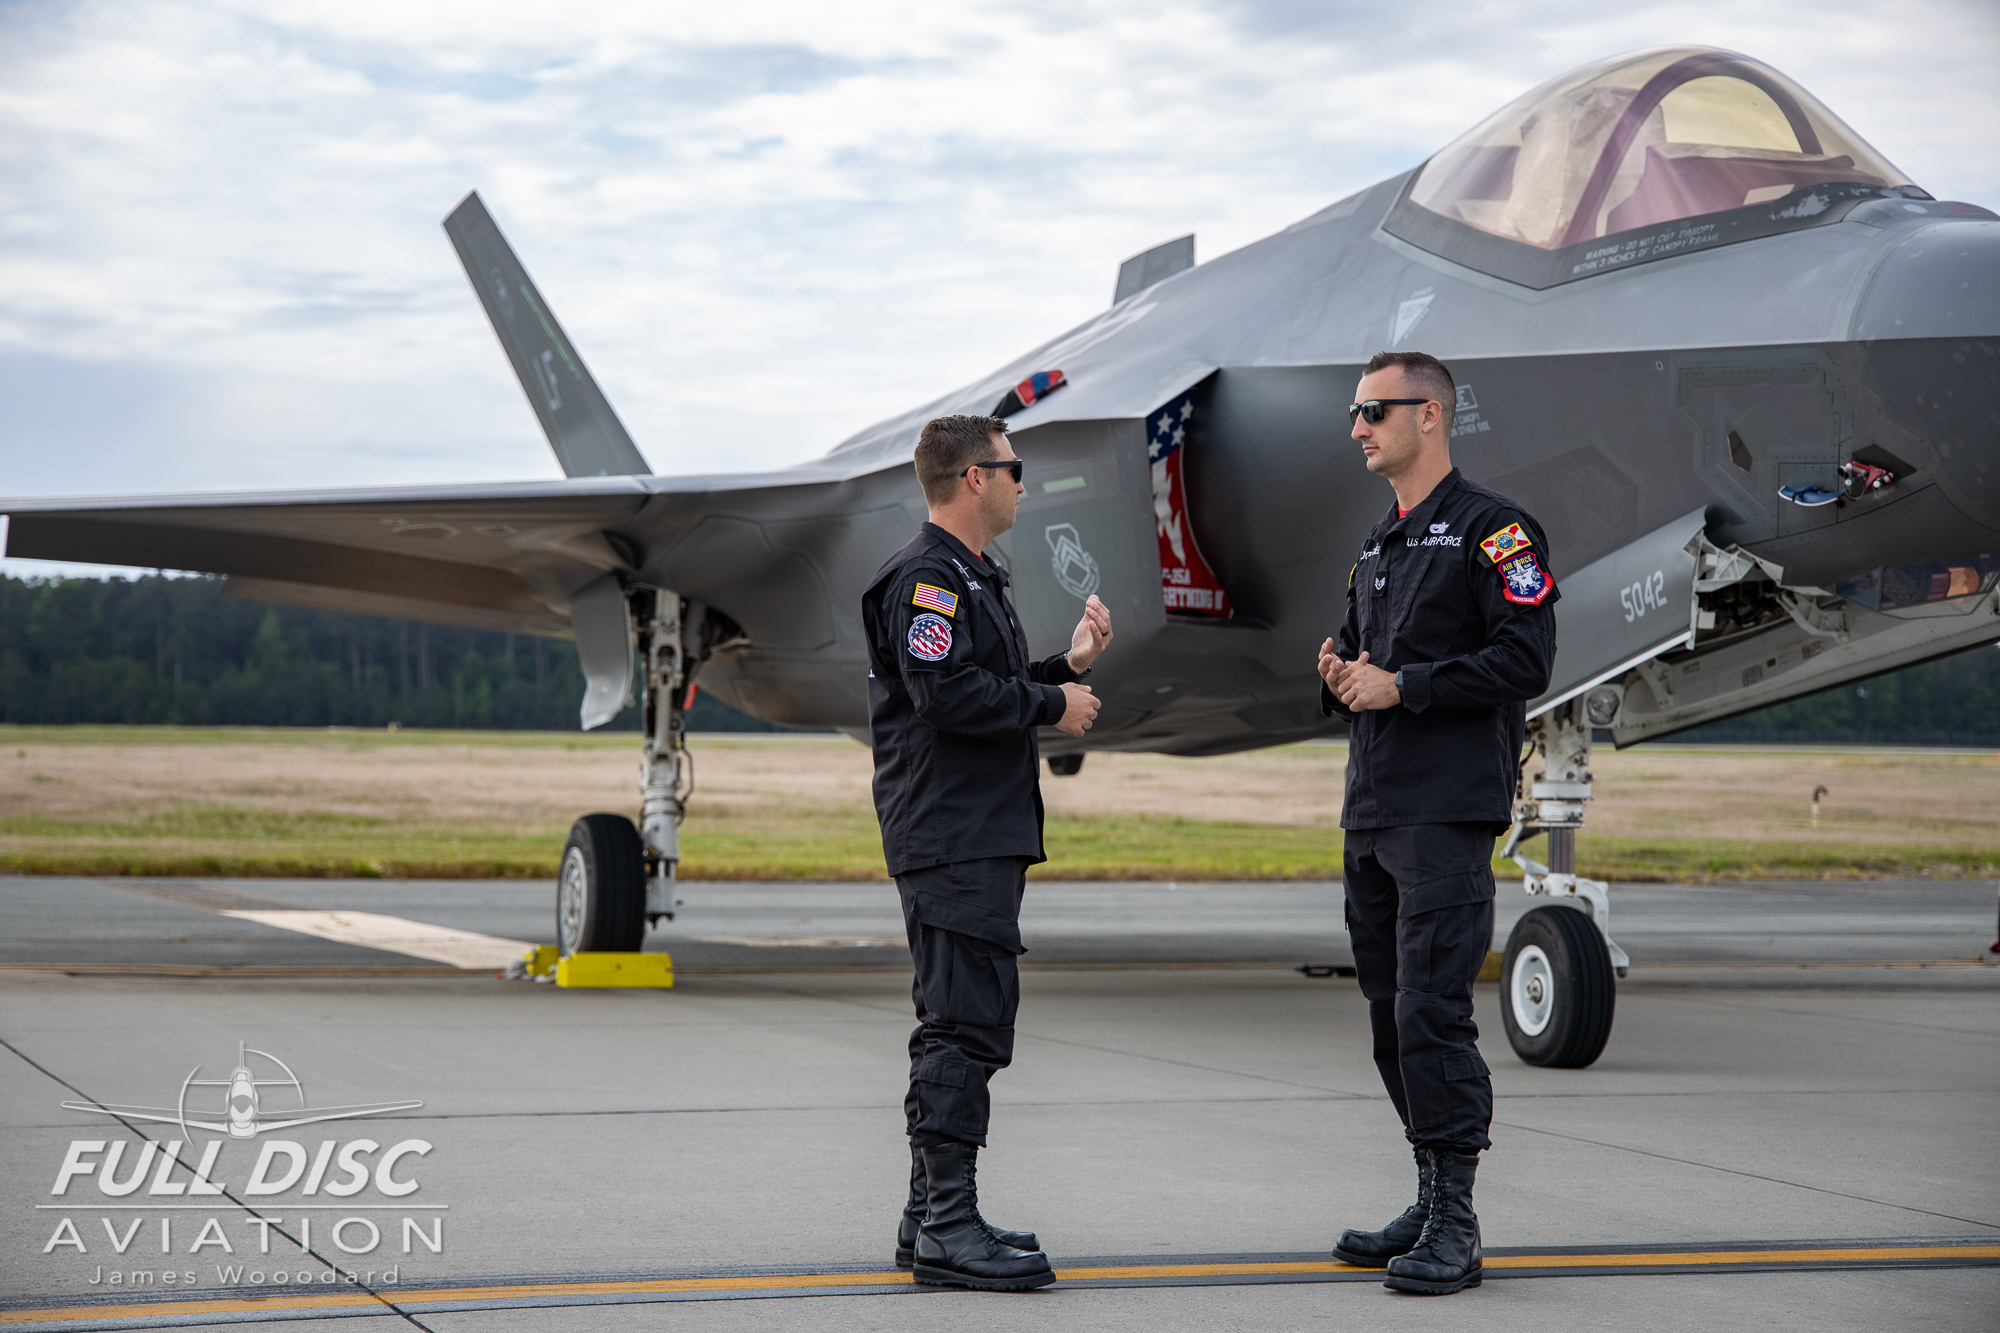 F35DemoTeam_FullDiscAviation_JamesWoodard-April 28, 2019-19.jpg